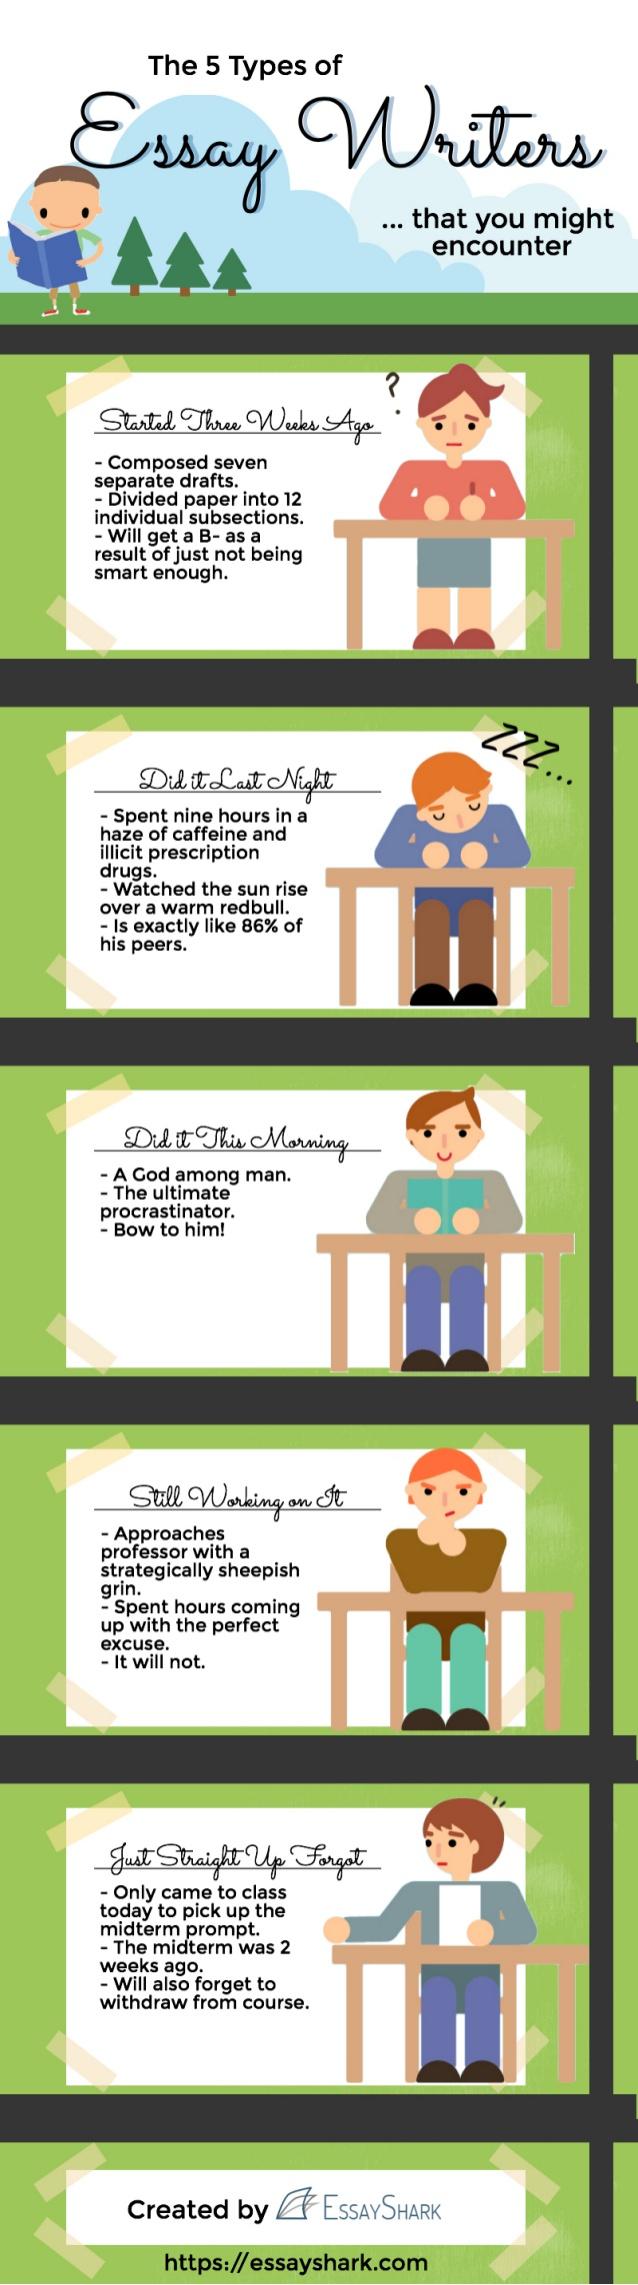 Five types of essays